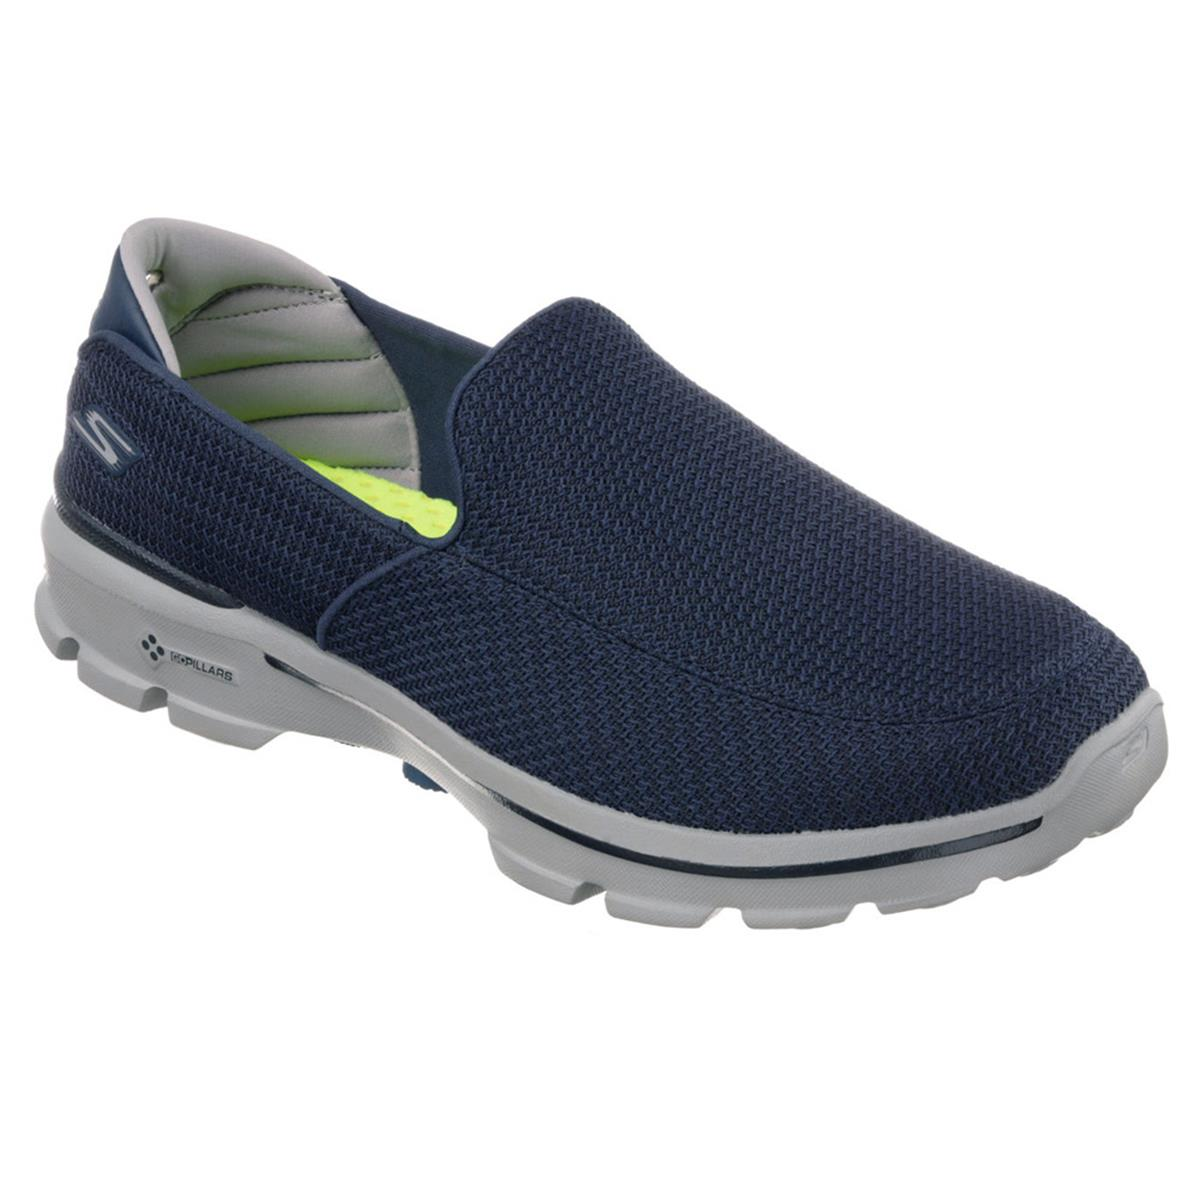 Skechers GoWalk 3 Mens Shoes (Navy) | Direct Running